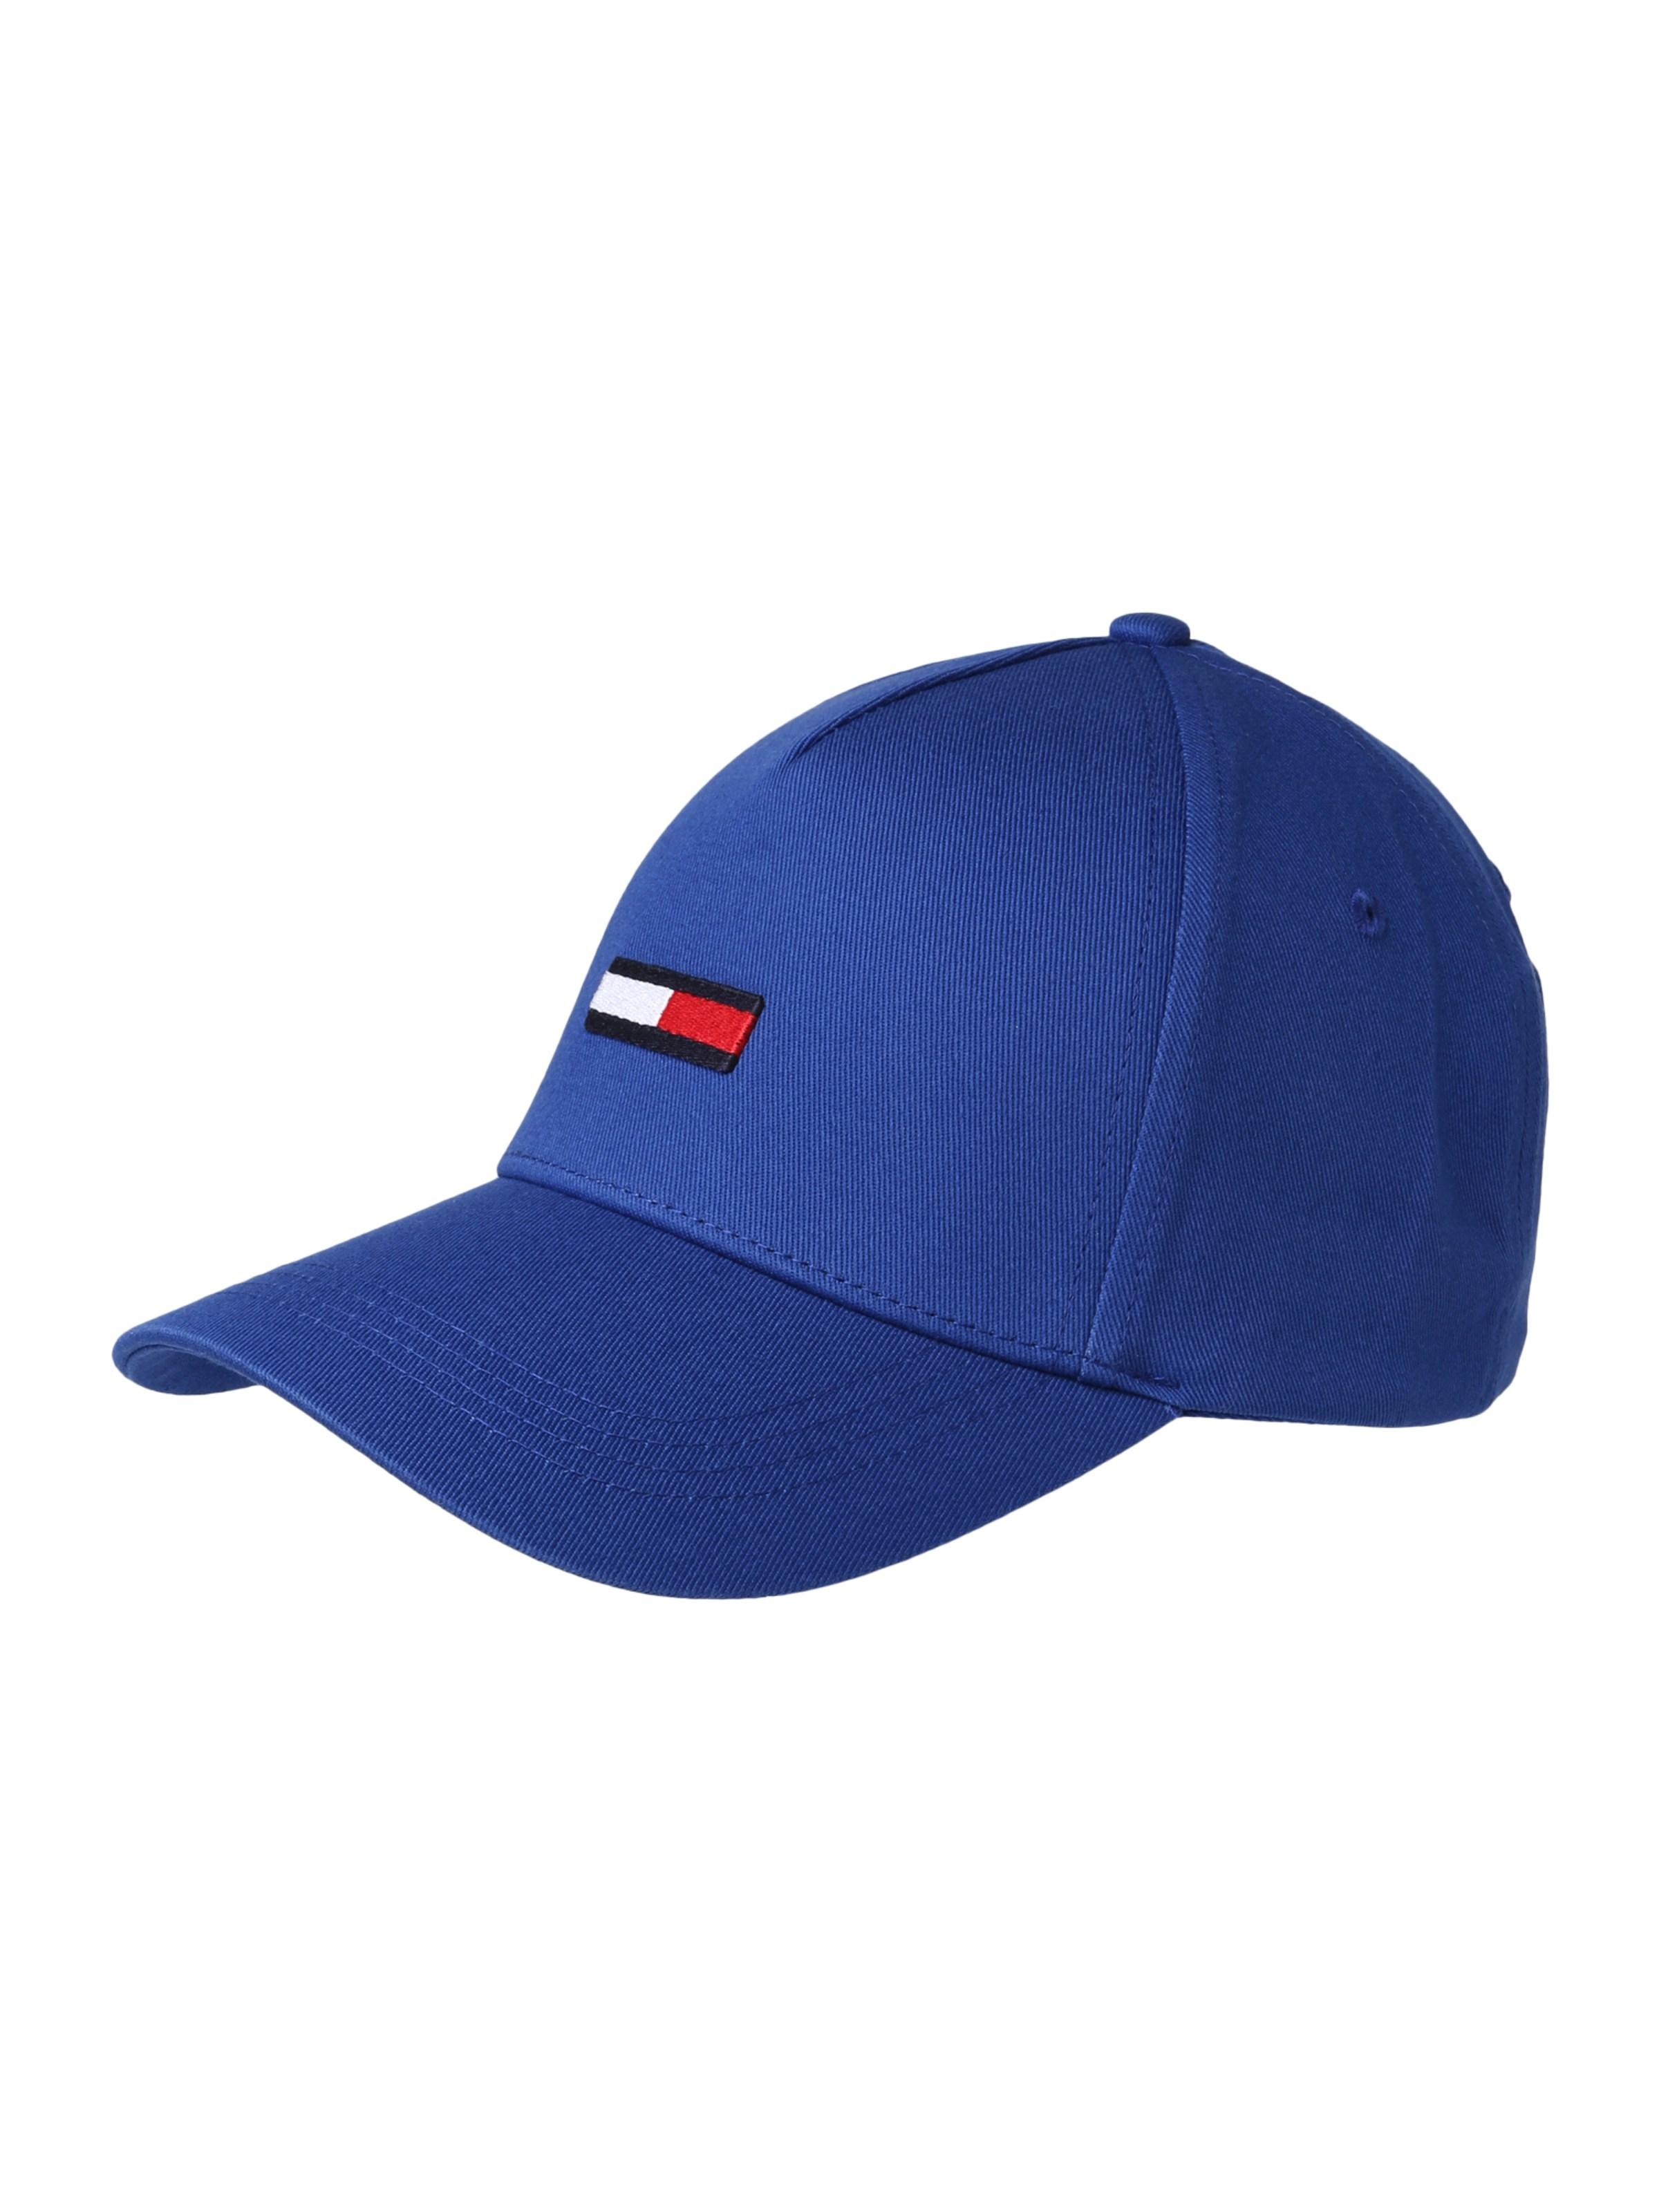 TOMMY HILFIGER Kšiltovka  TJU FLAG CAP  modrá - Glami.cz 46f6a2f016